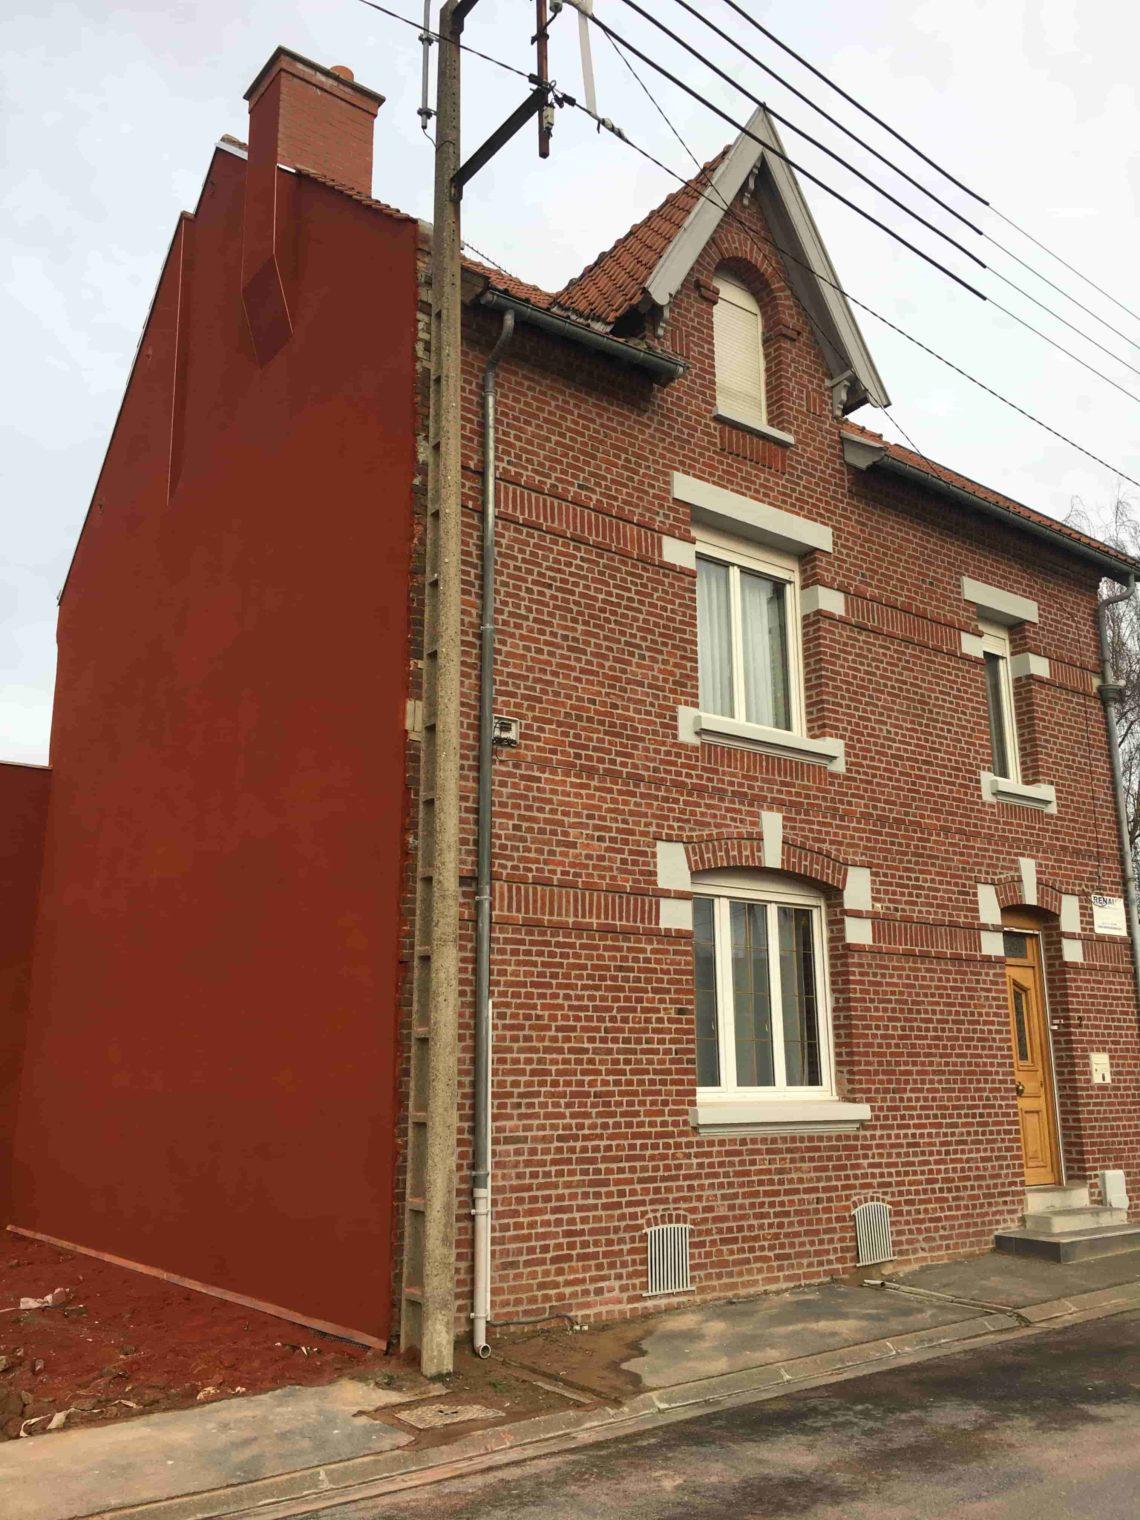 Urbel-ravalement-de-facade-Cambrai-9-1140x1520.jpg